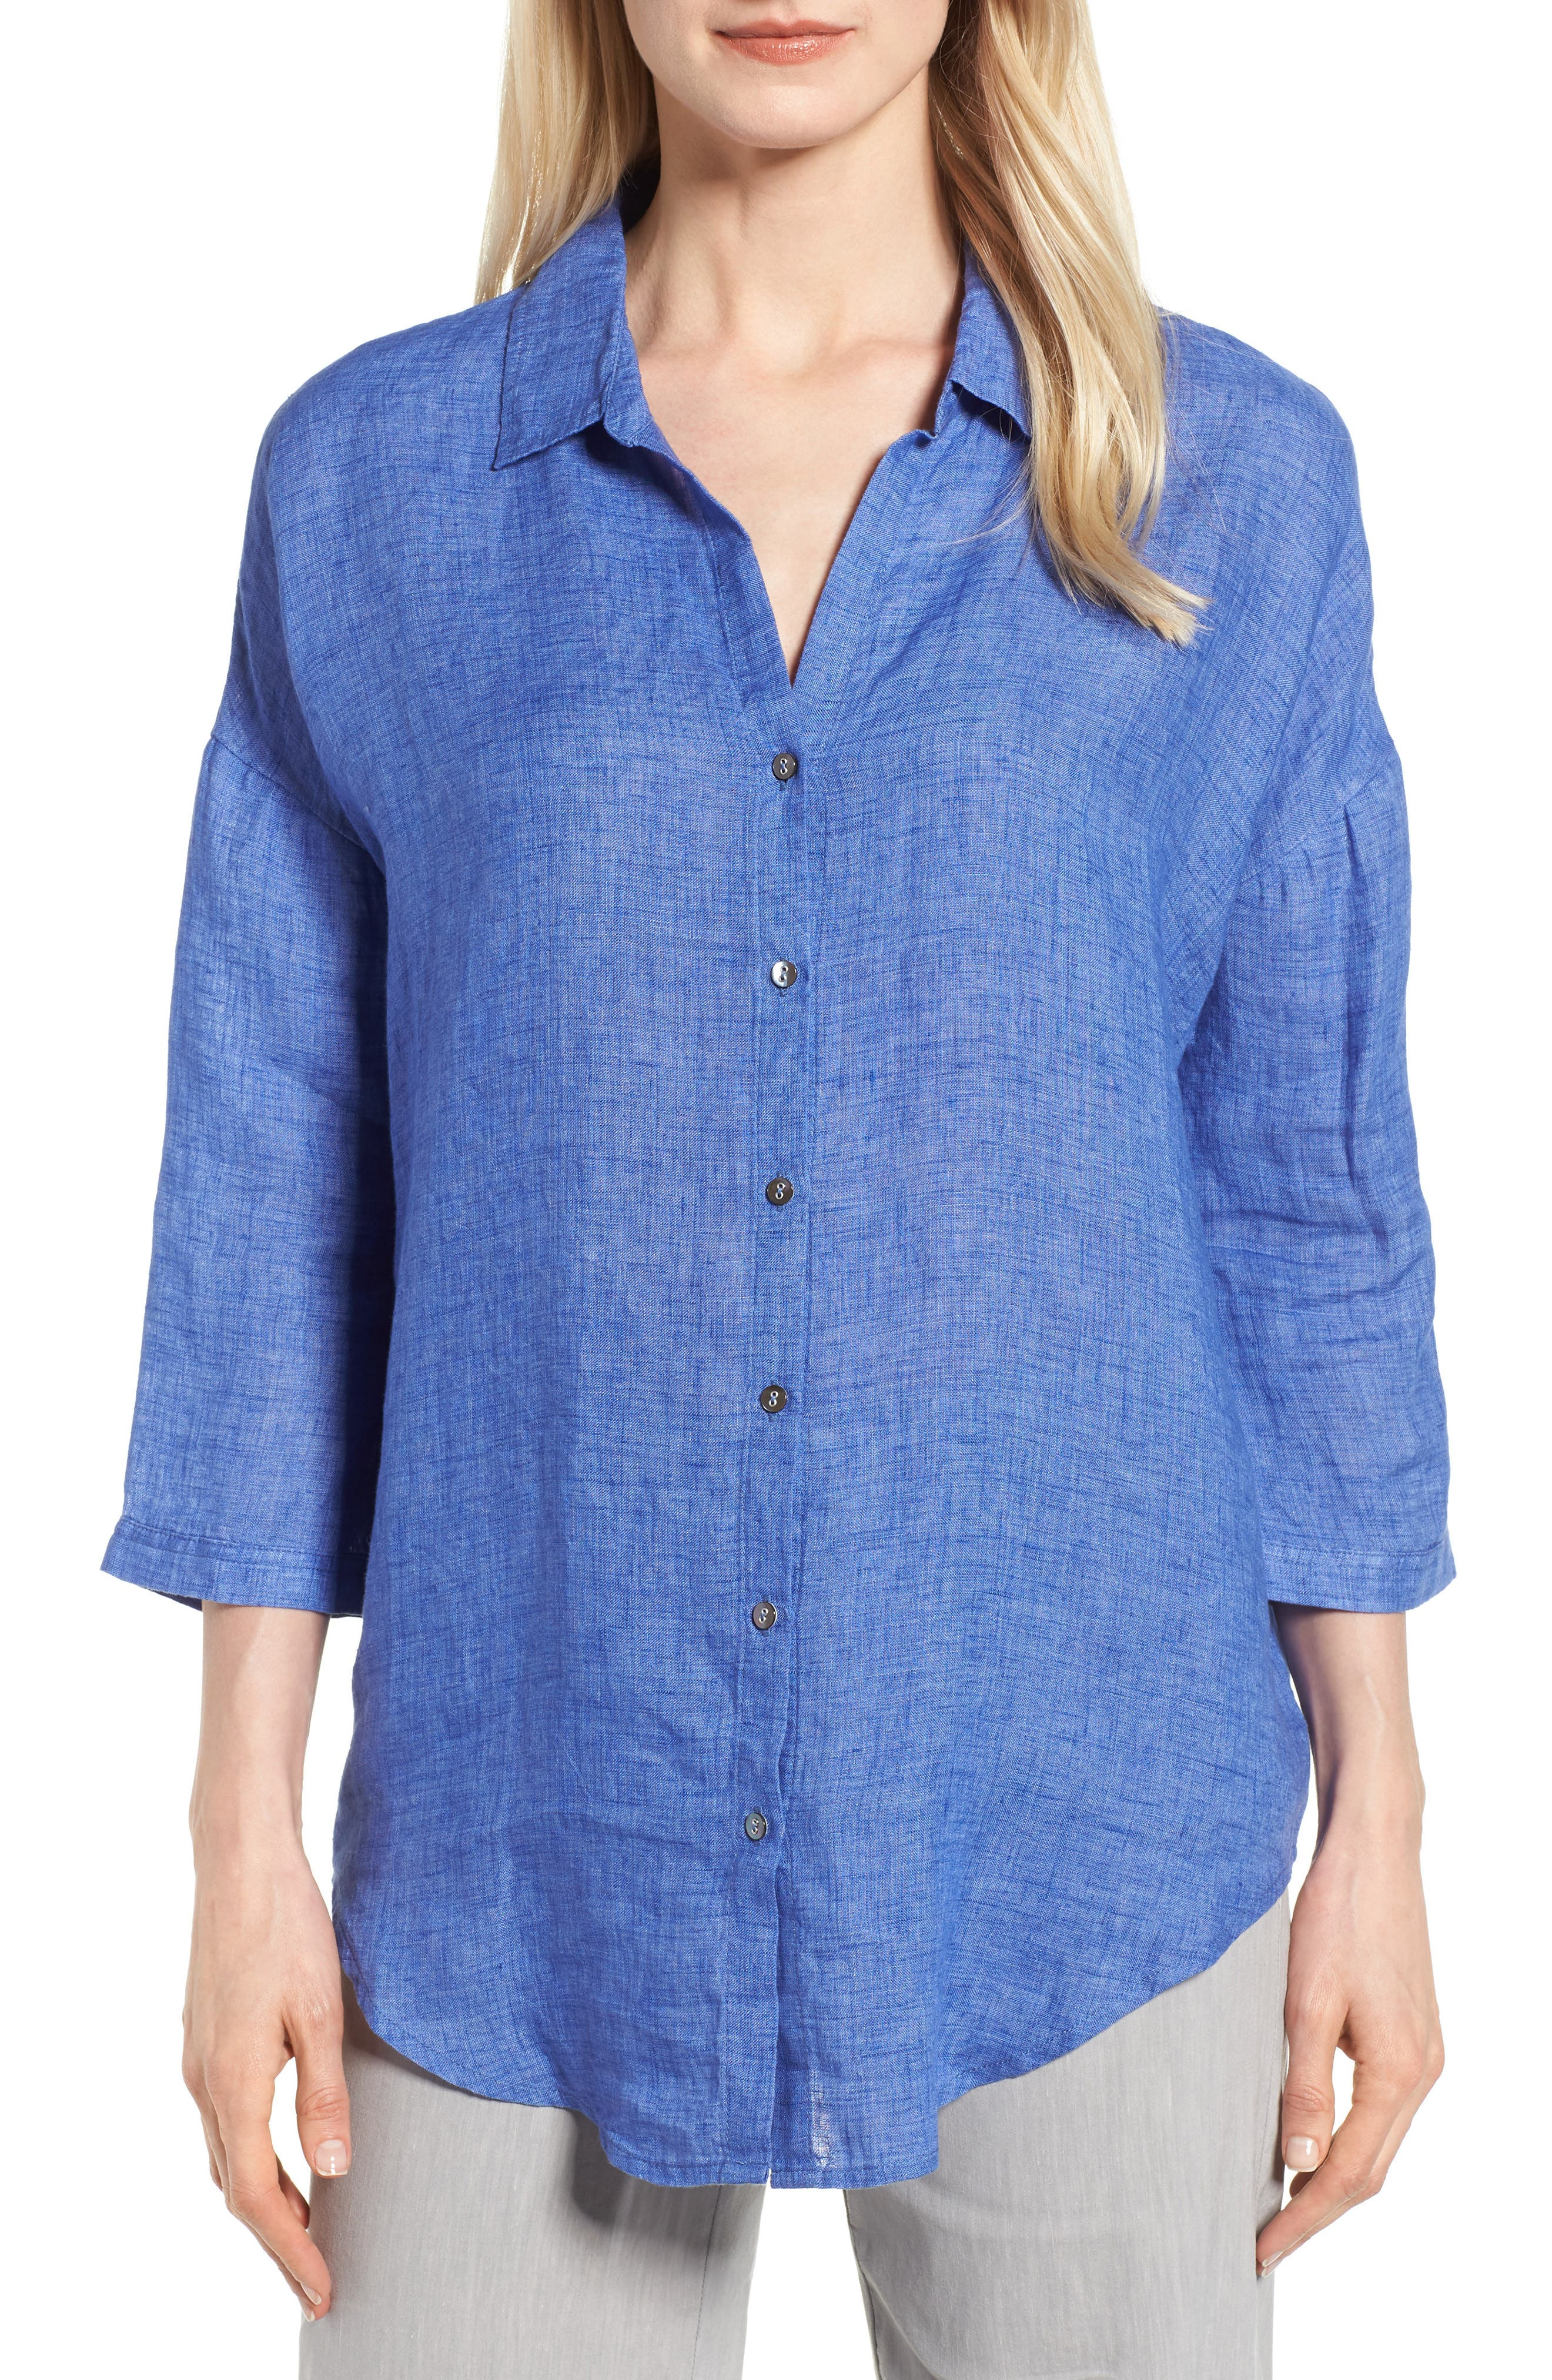 Joy Ride Linen Tunic Top,                         Main,                         color, Ultramarine